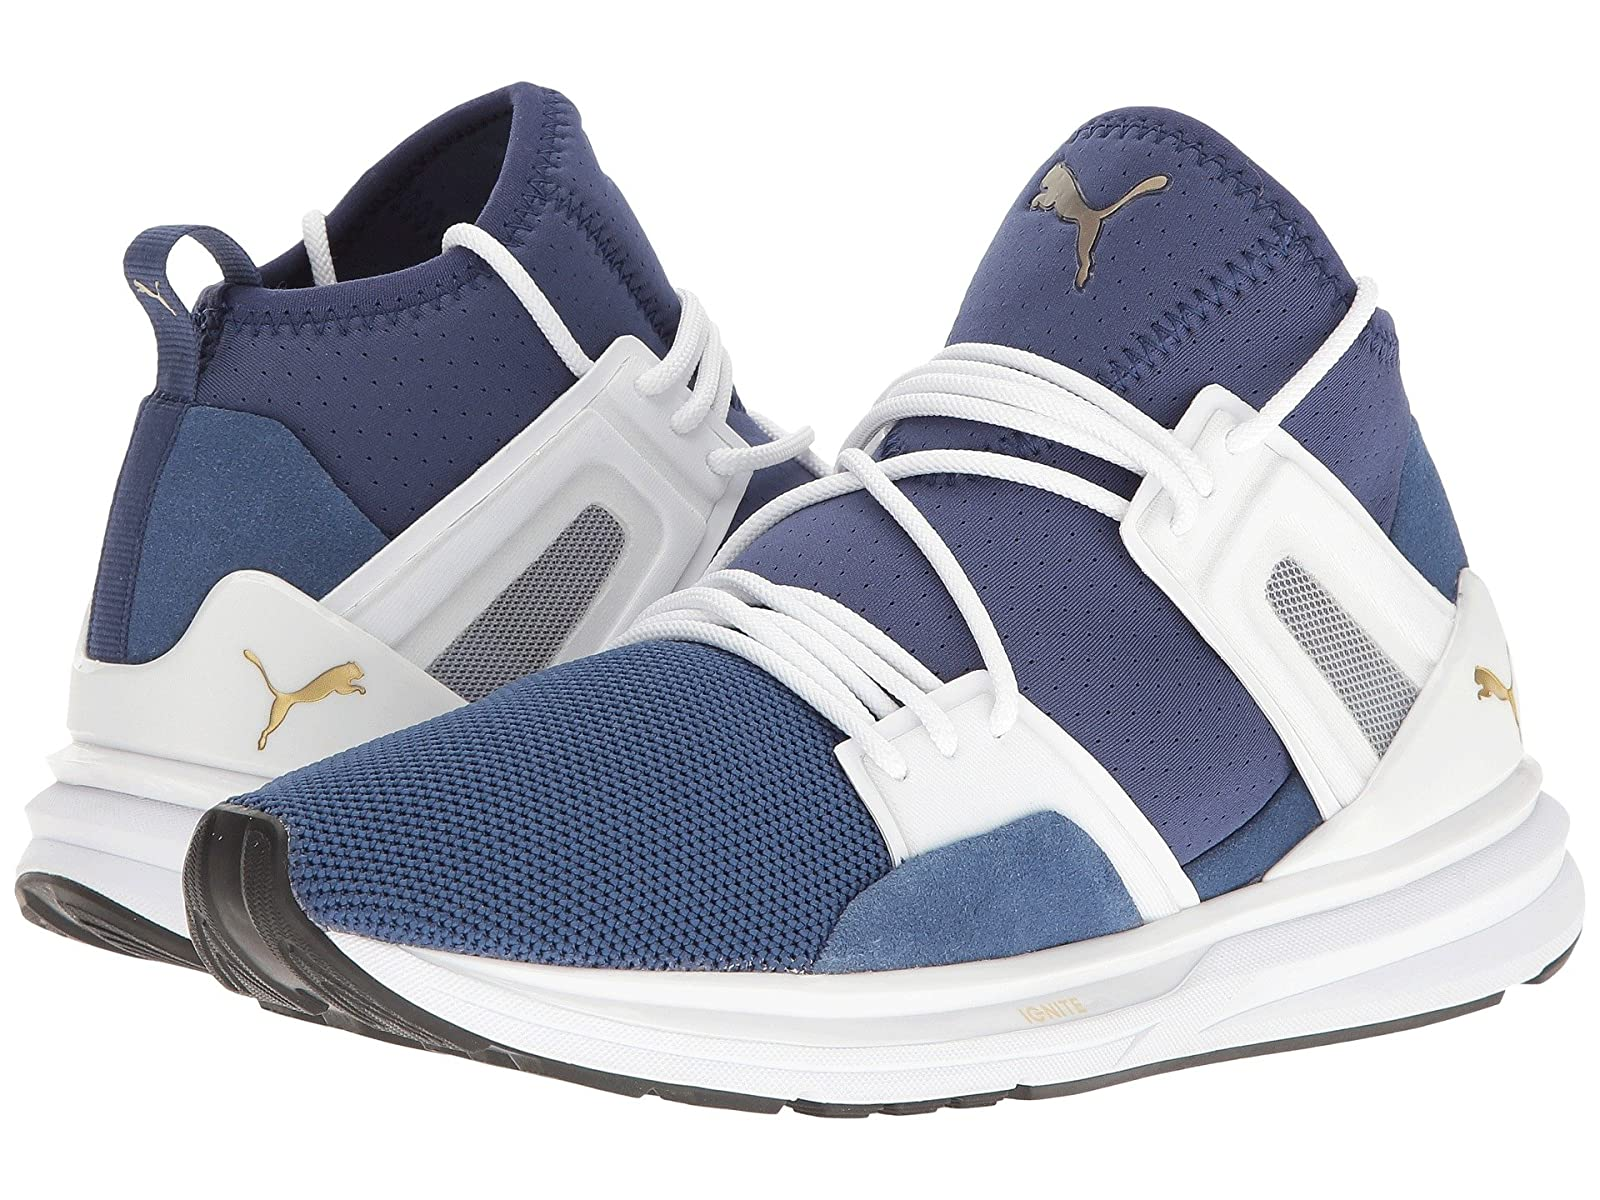 PUMA B.O.G Limitless Hi DenimCheap and distinctive eye-catching shoes